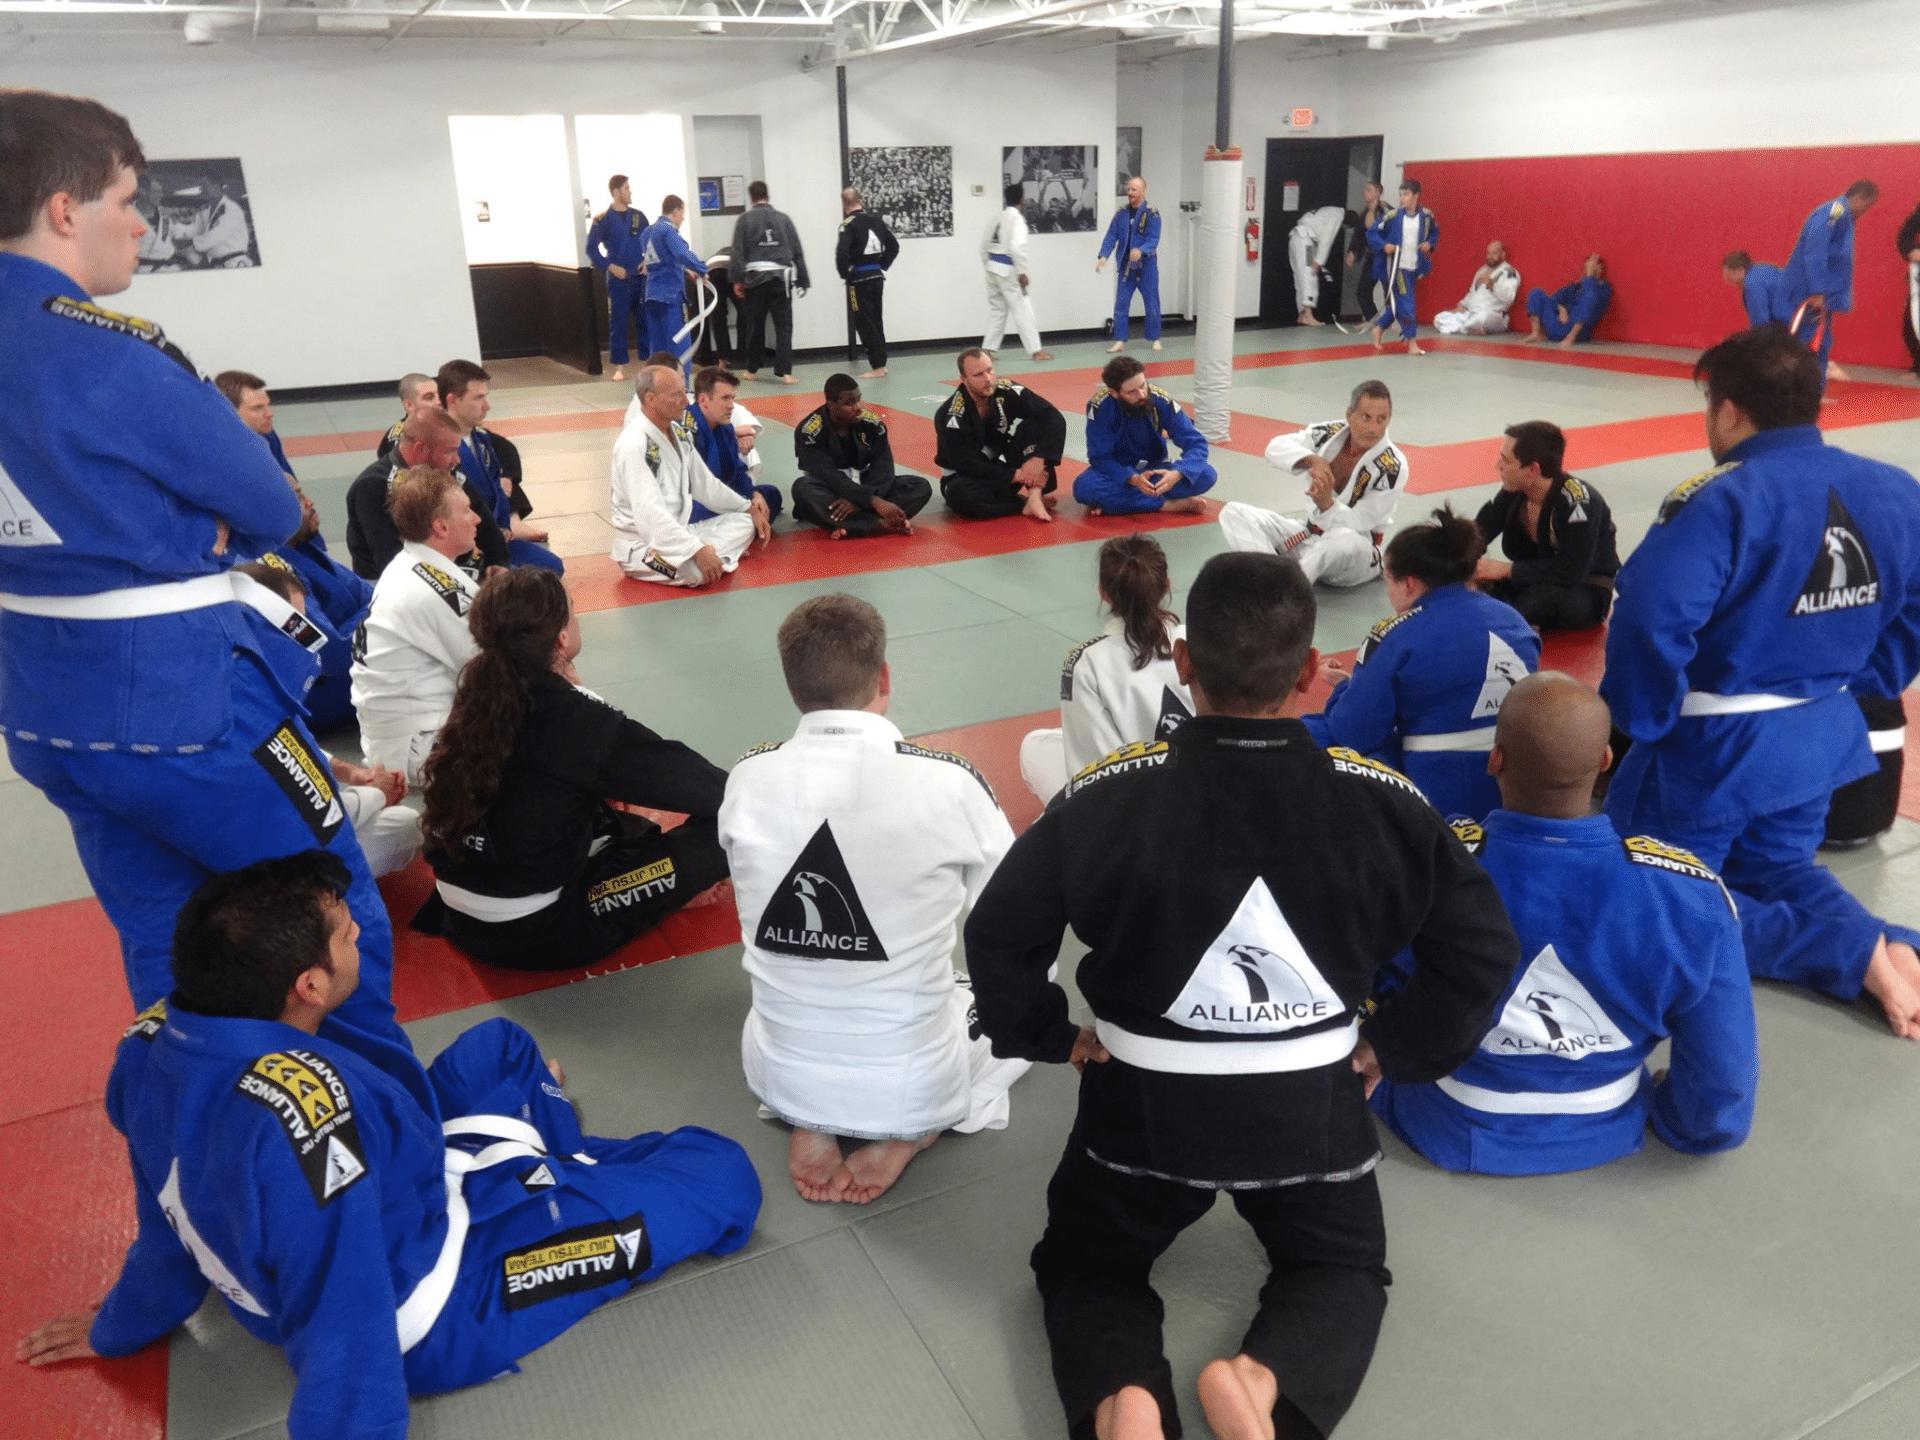 Alliance Jiu-Jitsu Atlanta Gallery Photo Number 4